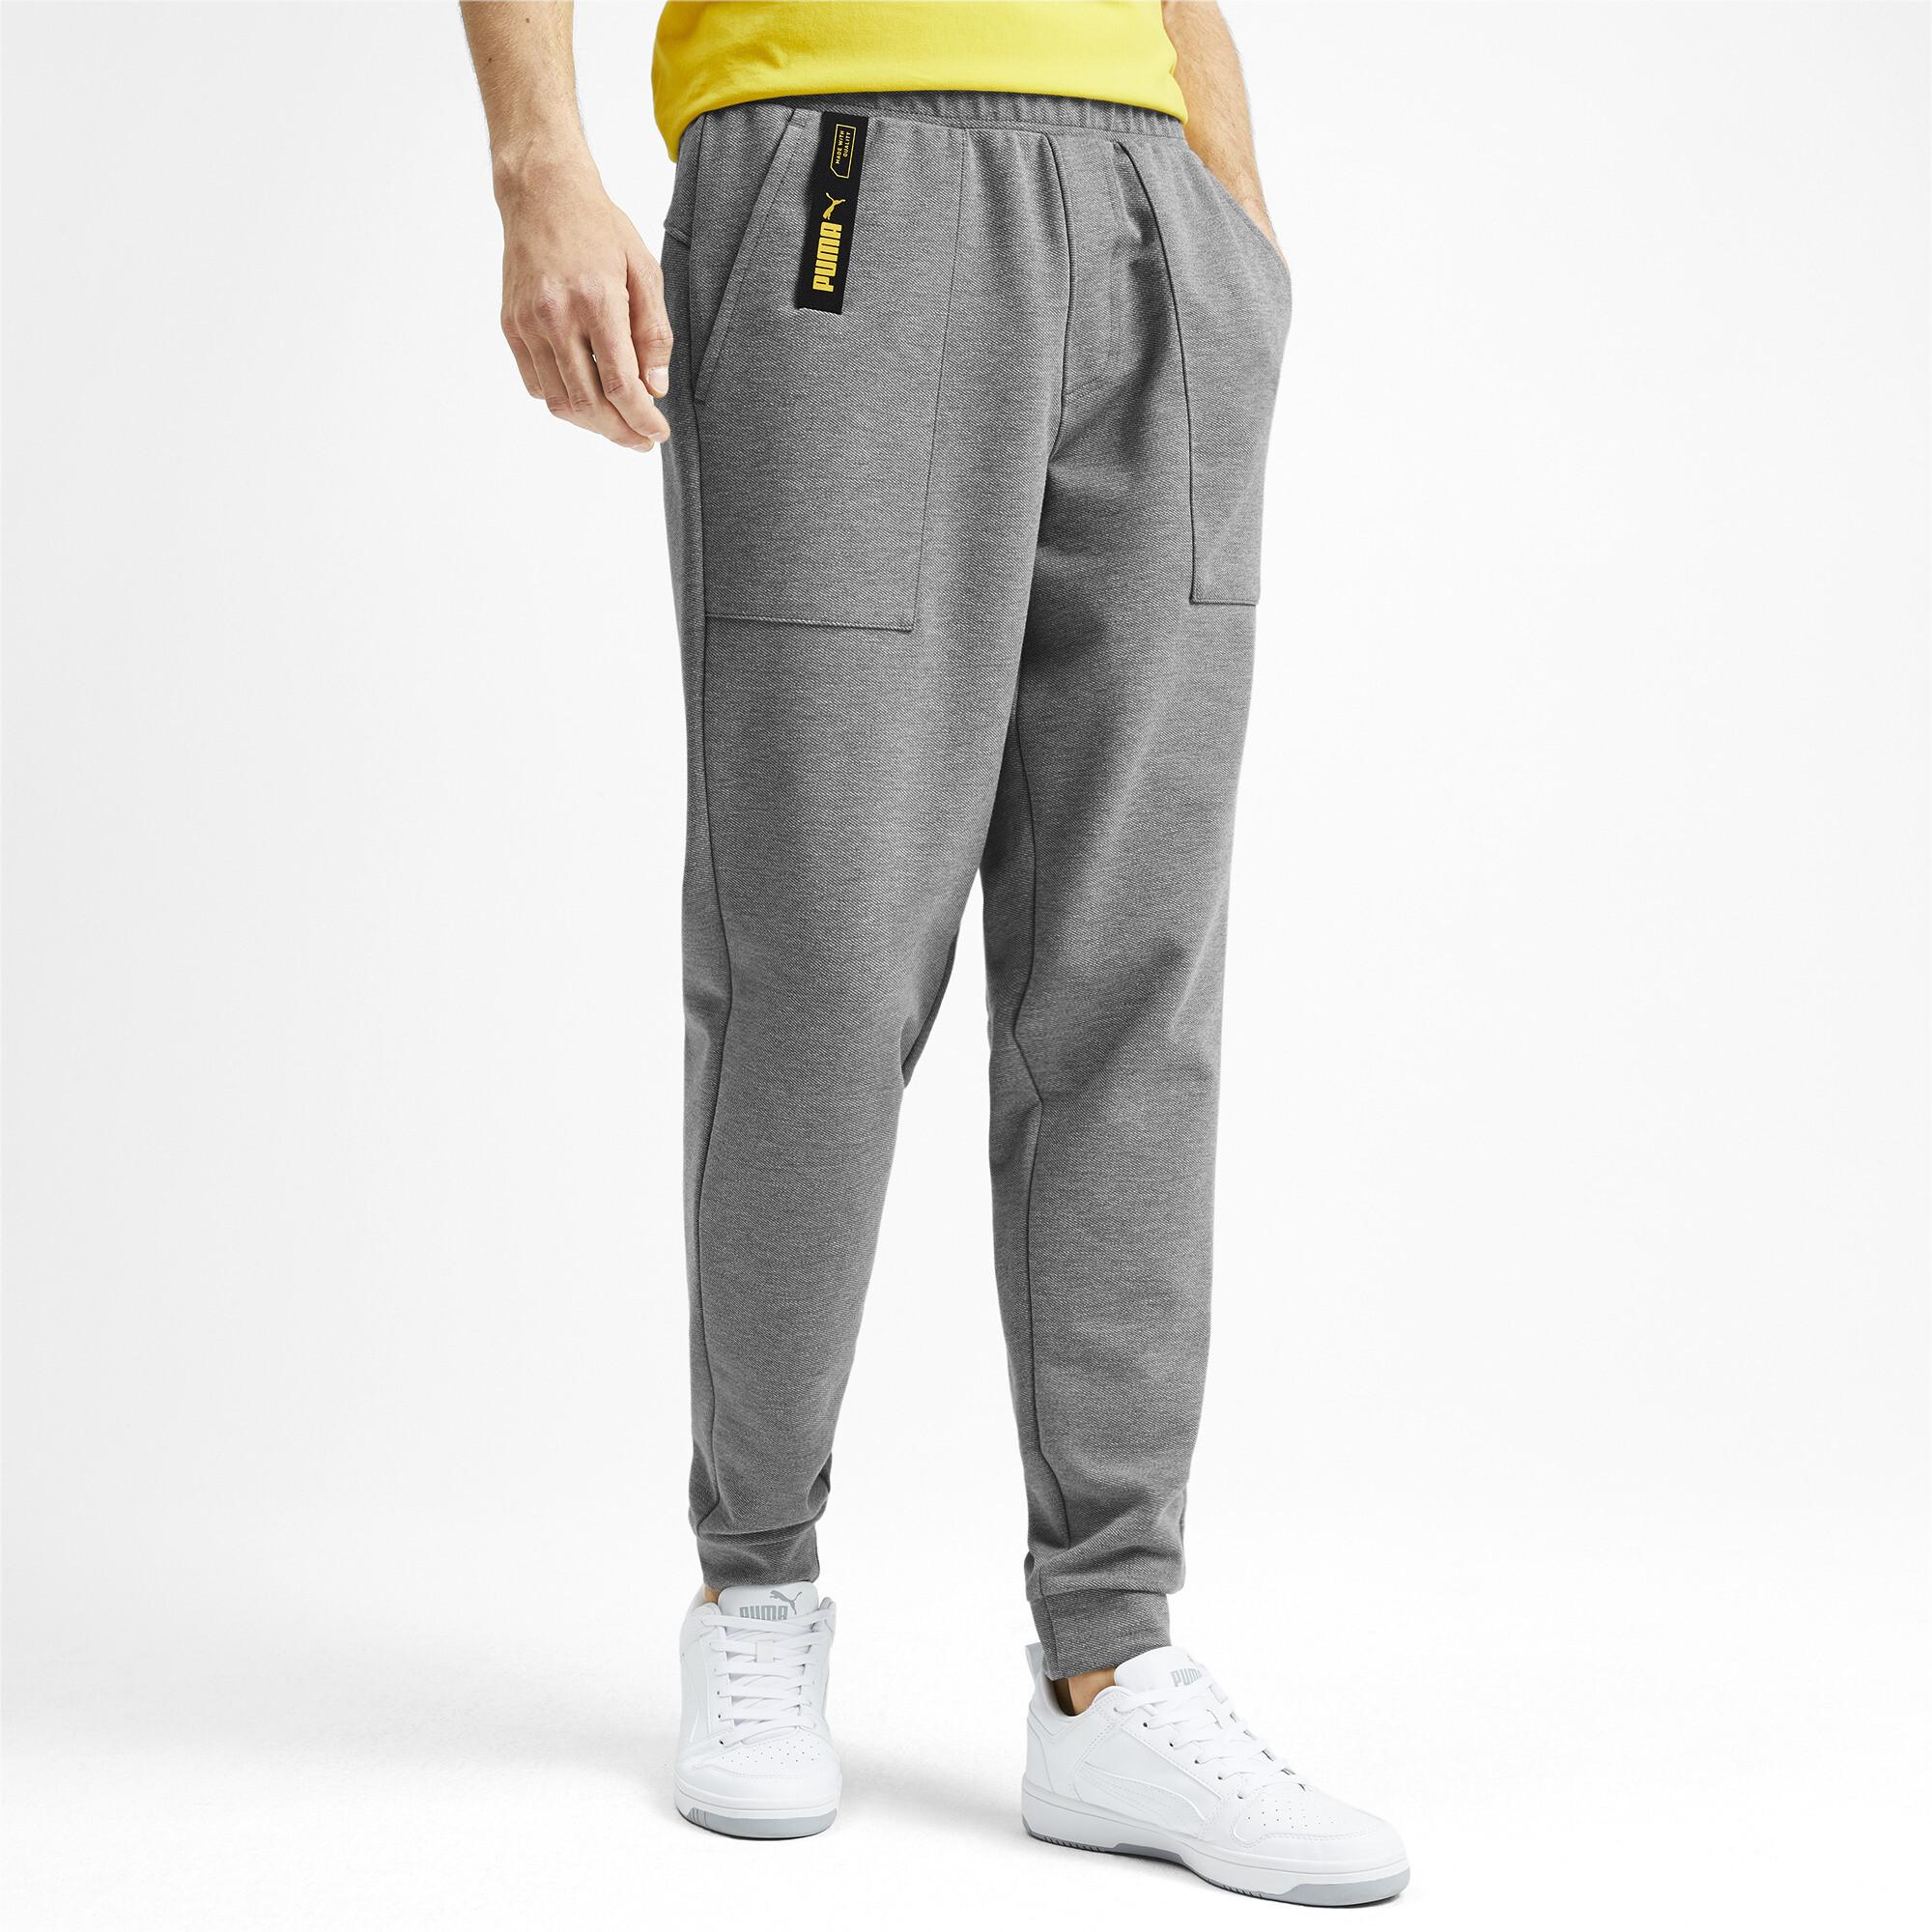 PUMA-NU-TILITY-Men-039-s-Sweatpants-Men-Knitted-Pants-Basics thumbnail 4